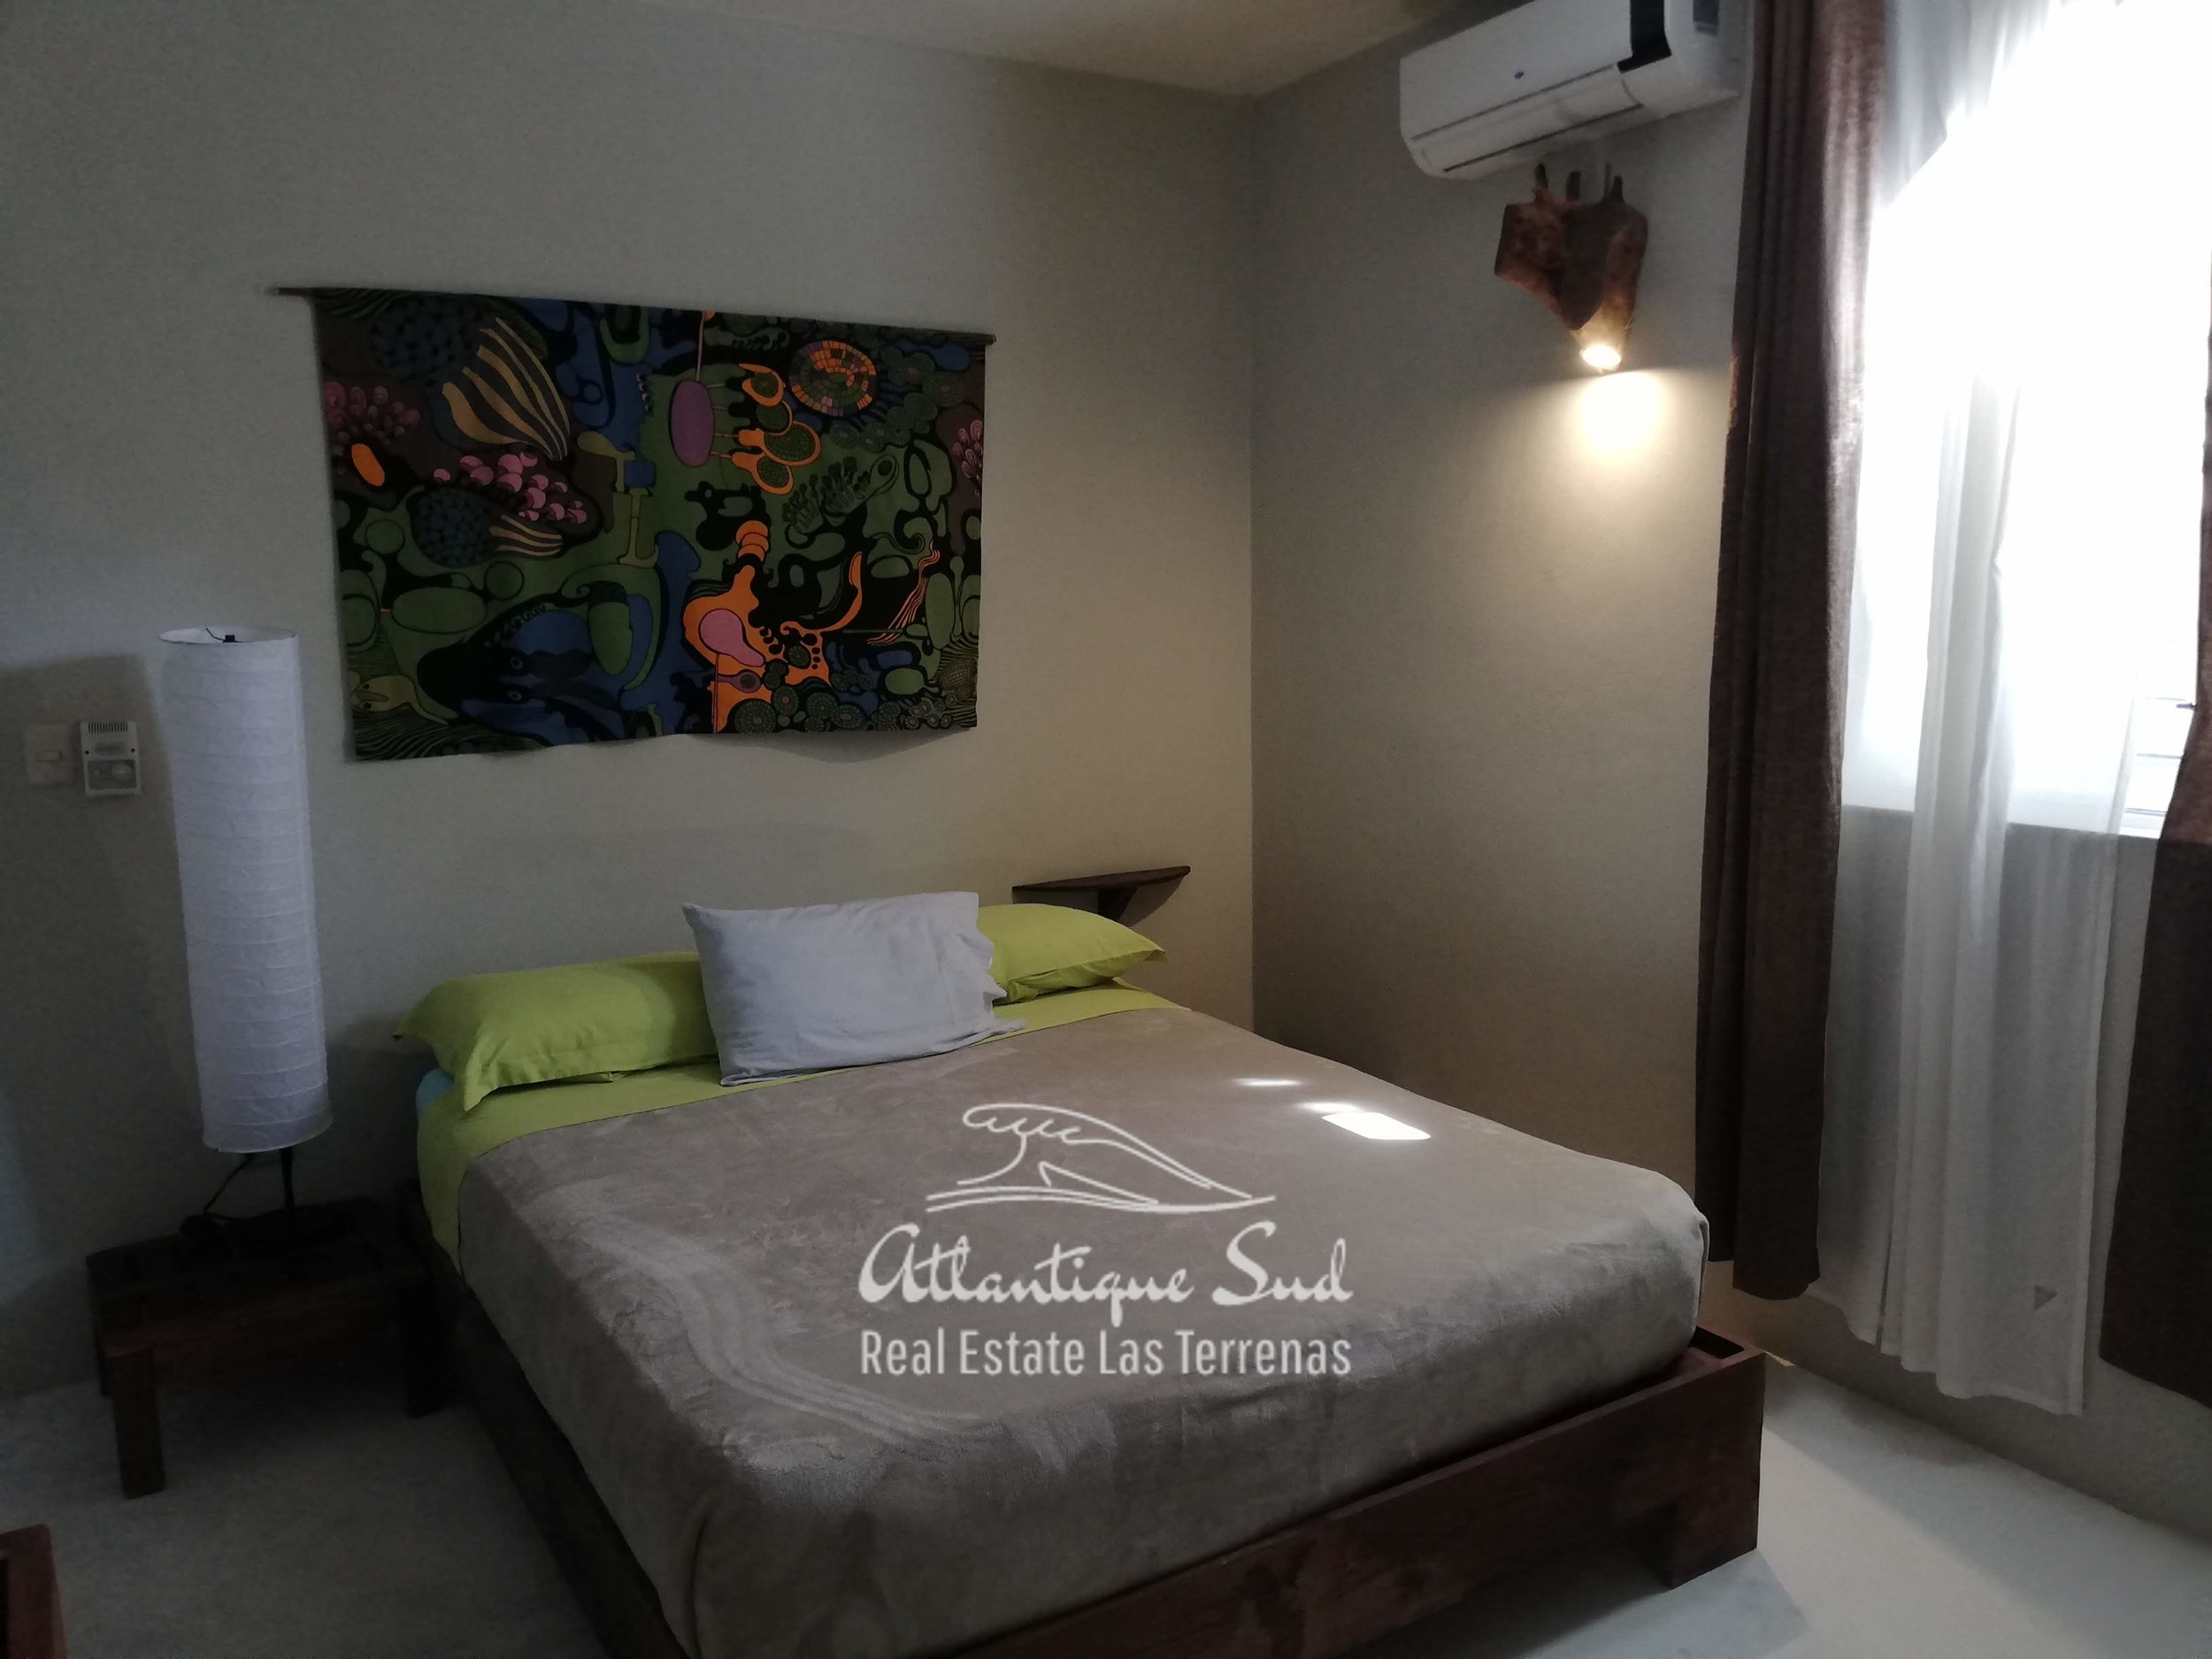 Typical caribbean hotel for sale Real Estate Las Terrenas Dominican Republic Atlantique Sud25.jpg